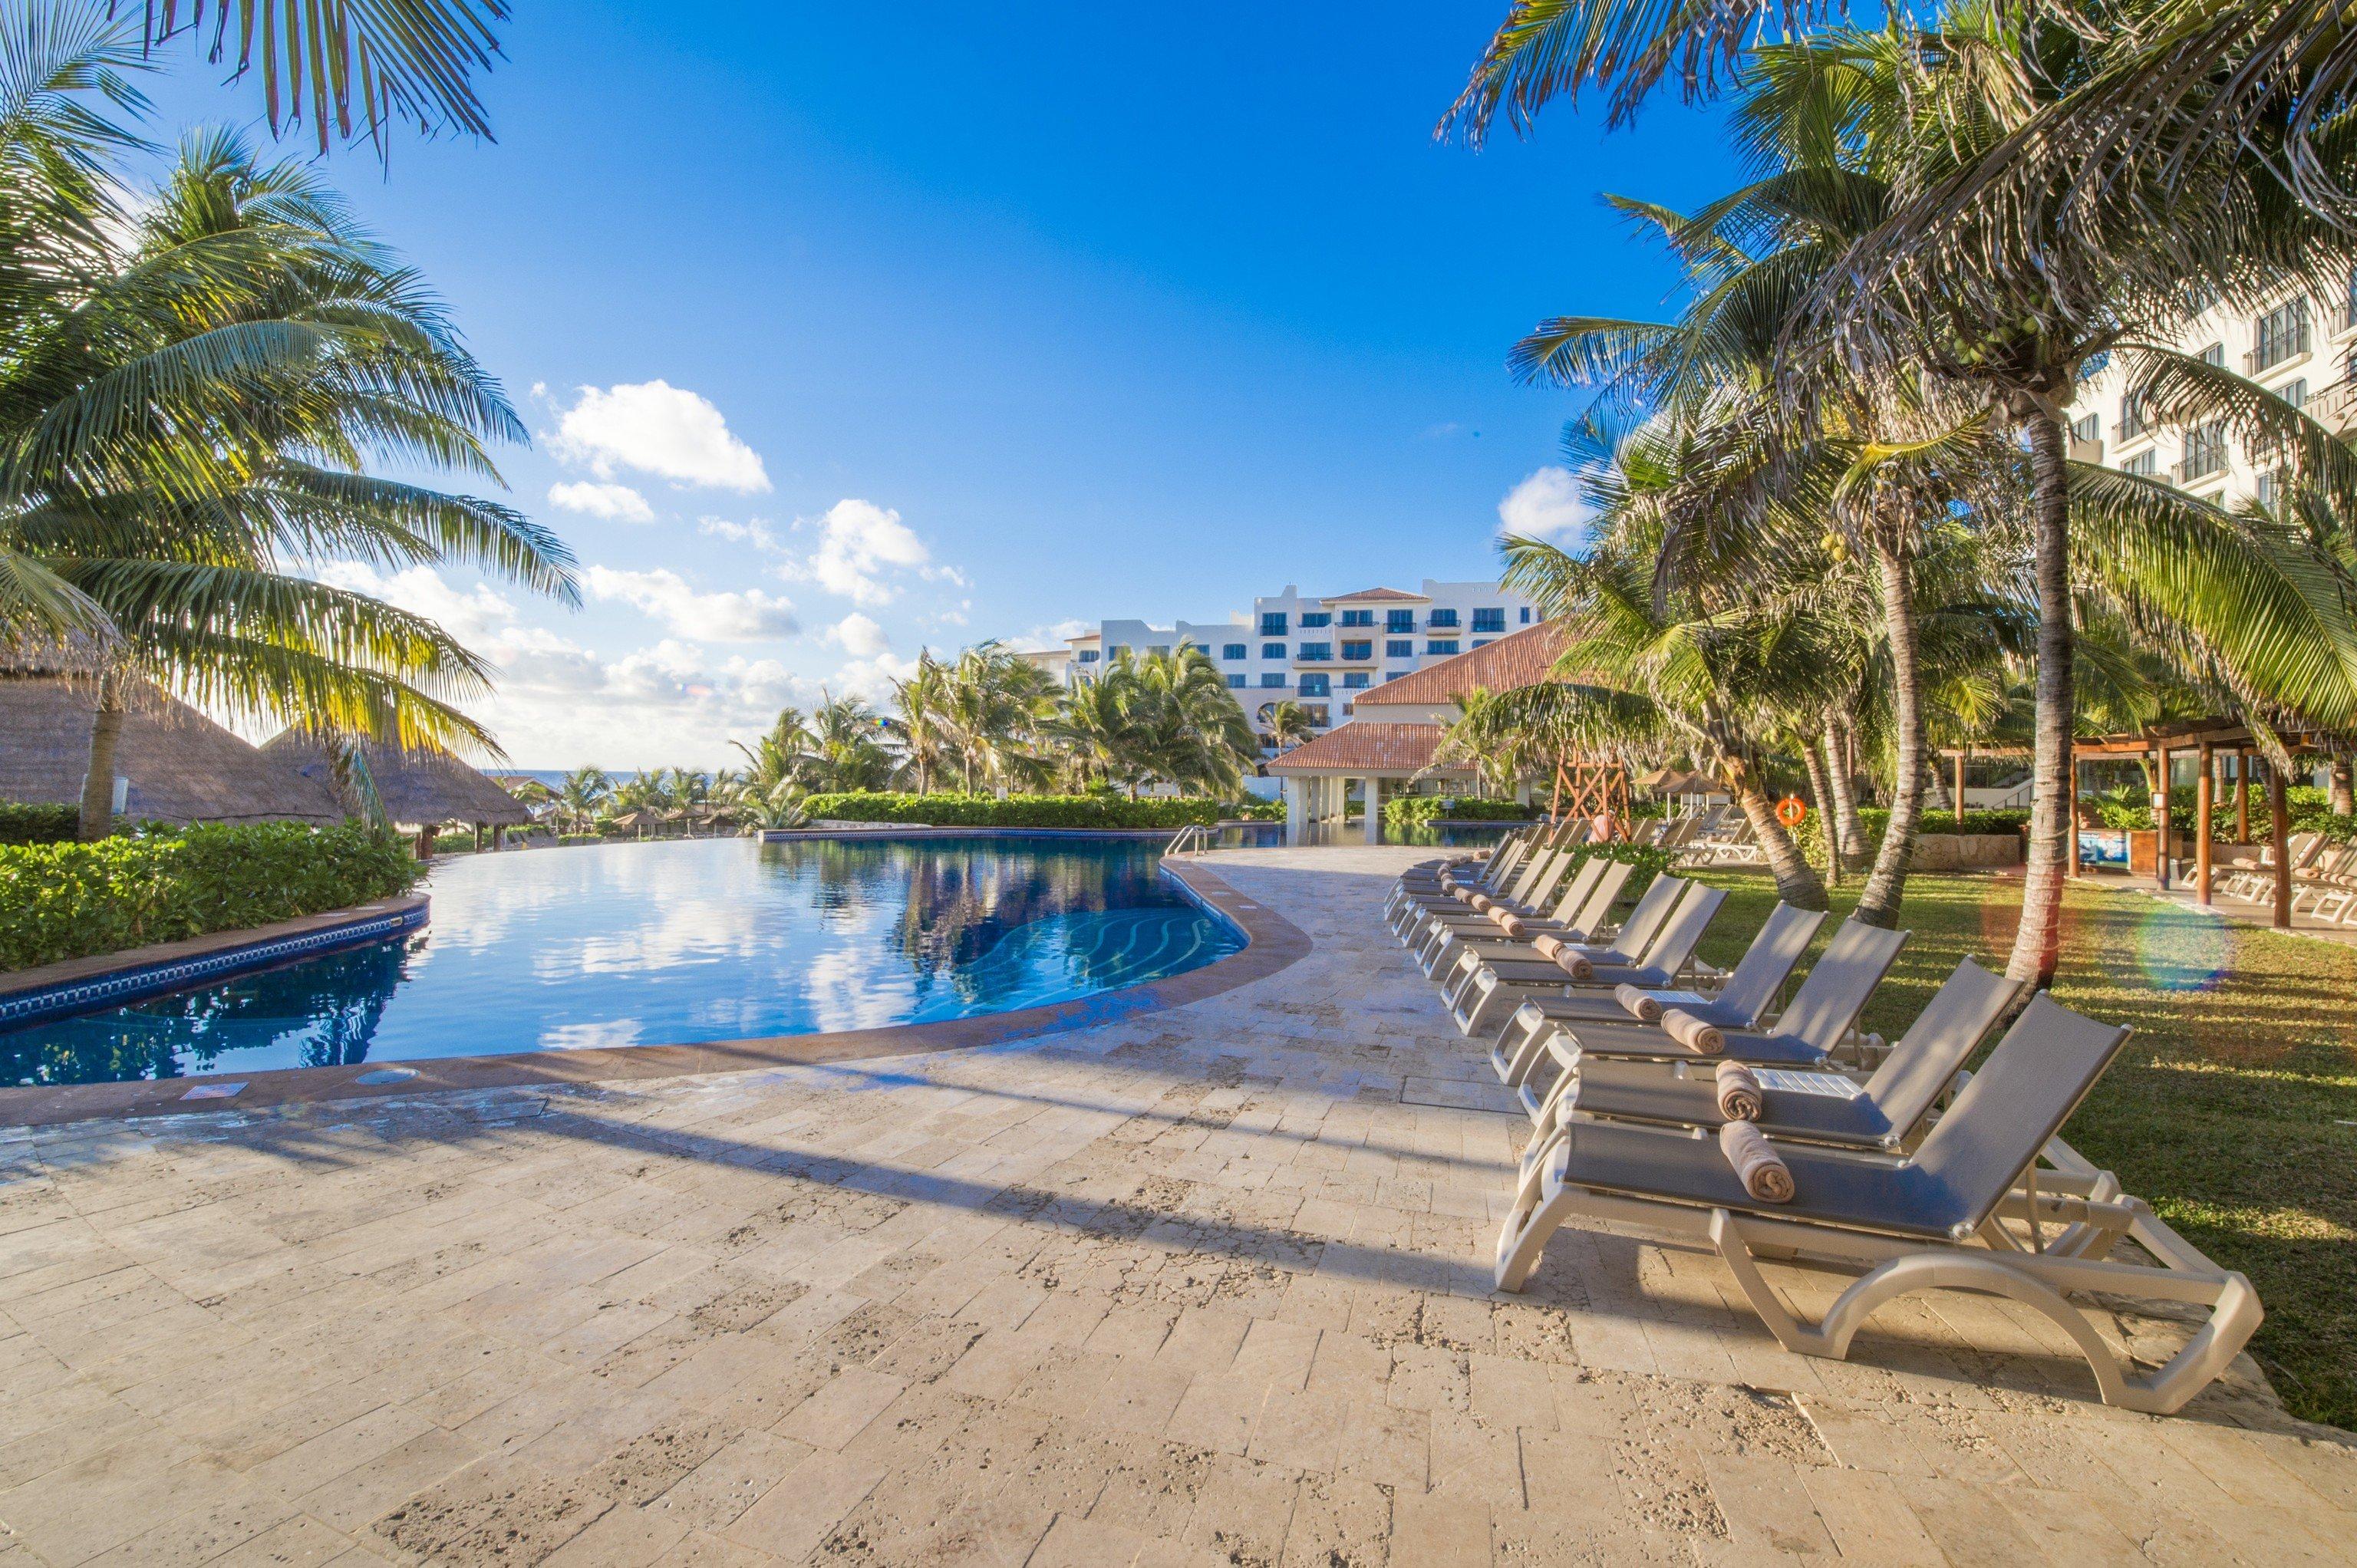 tree ground Resort water Beach property swimming pool leisure palm tree arecales resort town sky caribbean tropics Villa condominium hacienda shore plant lined sandy